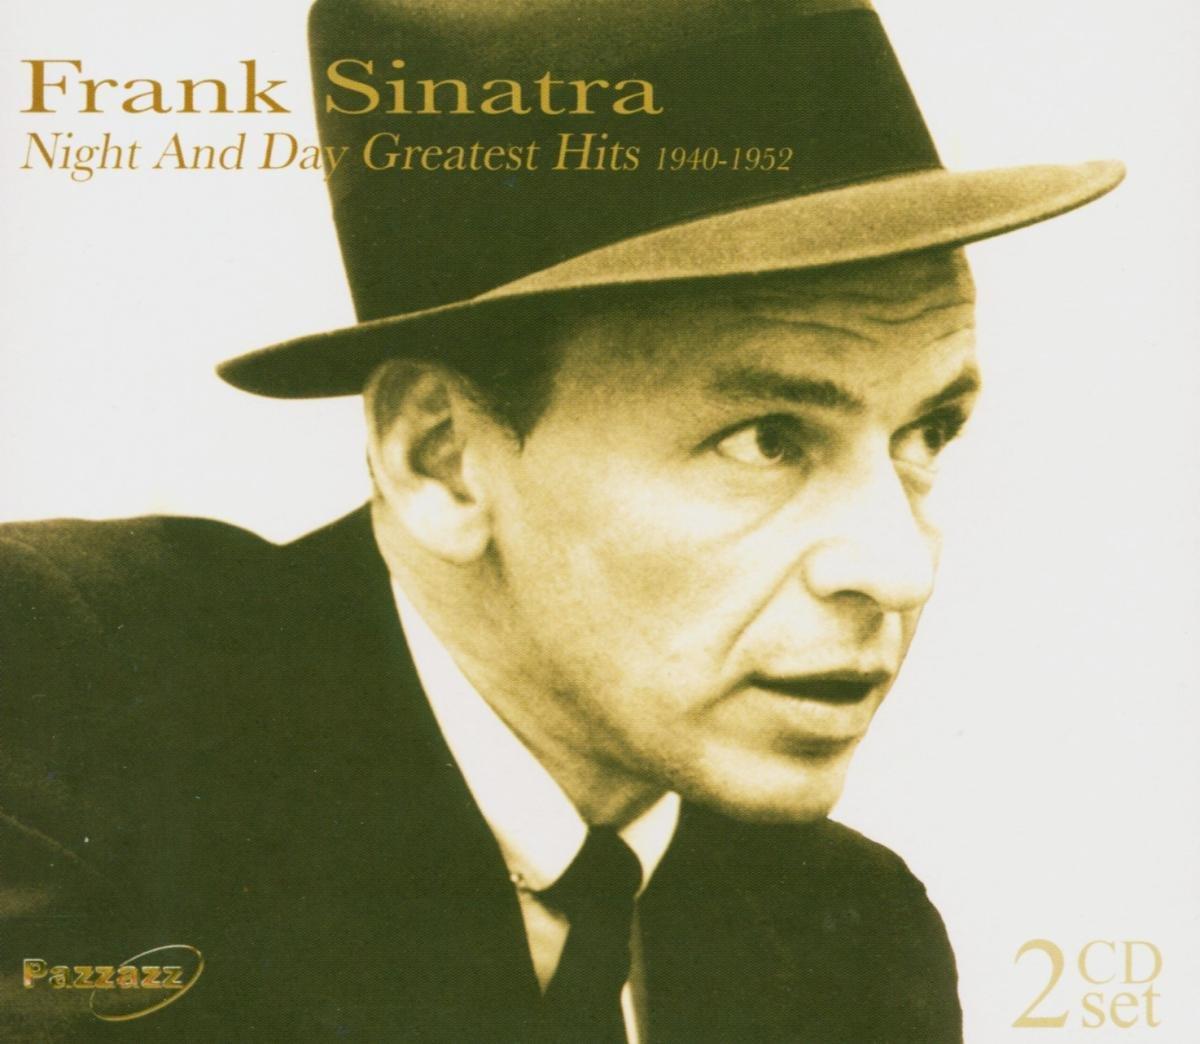 3394f5977108 Frank Sinatra - Night And Day Greatest Hits 1940-1952 - Amazon.com Music